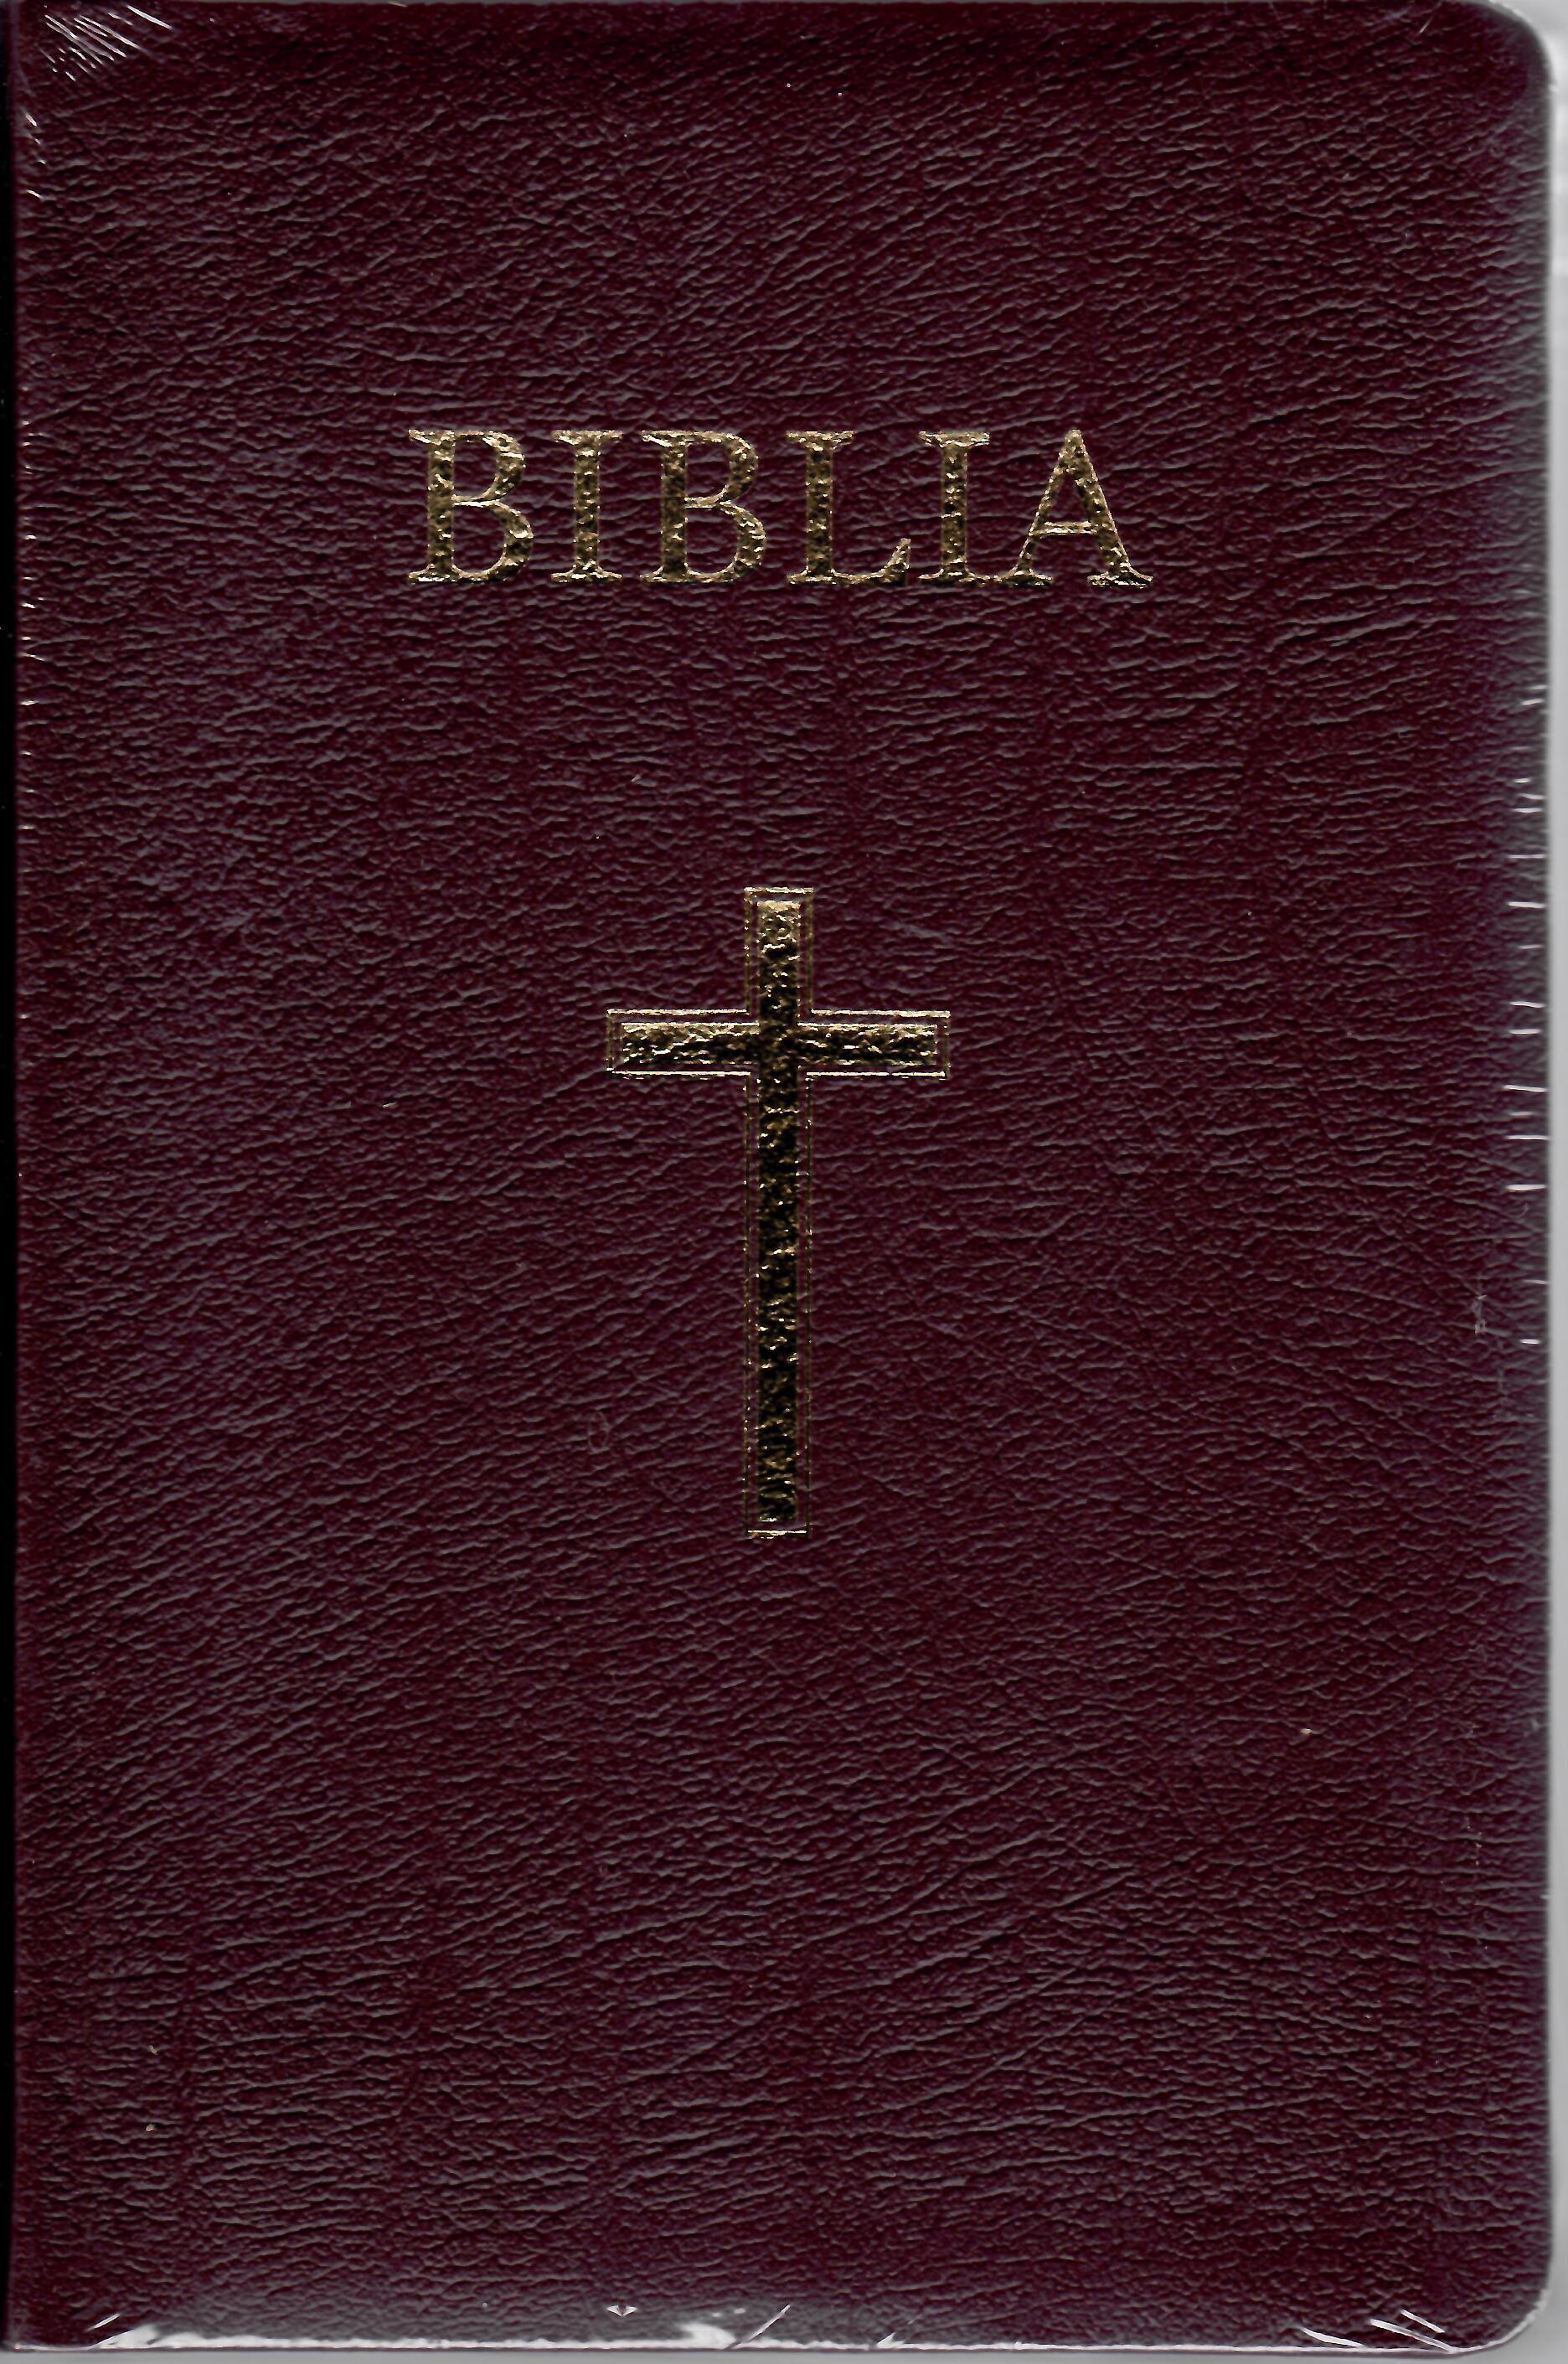 Biblia - mare, coperta piele, aurita, index, bordeaux